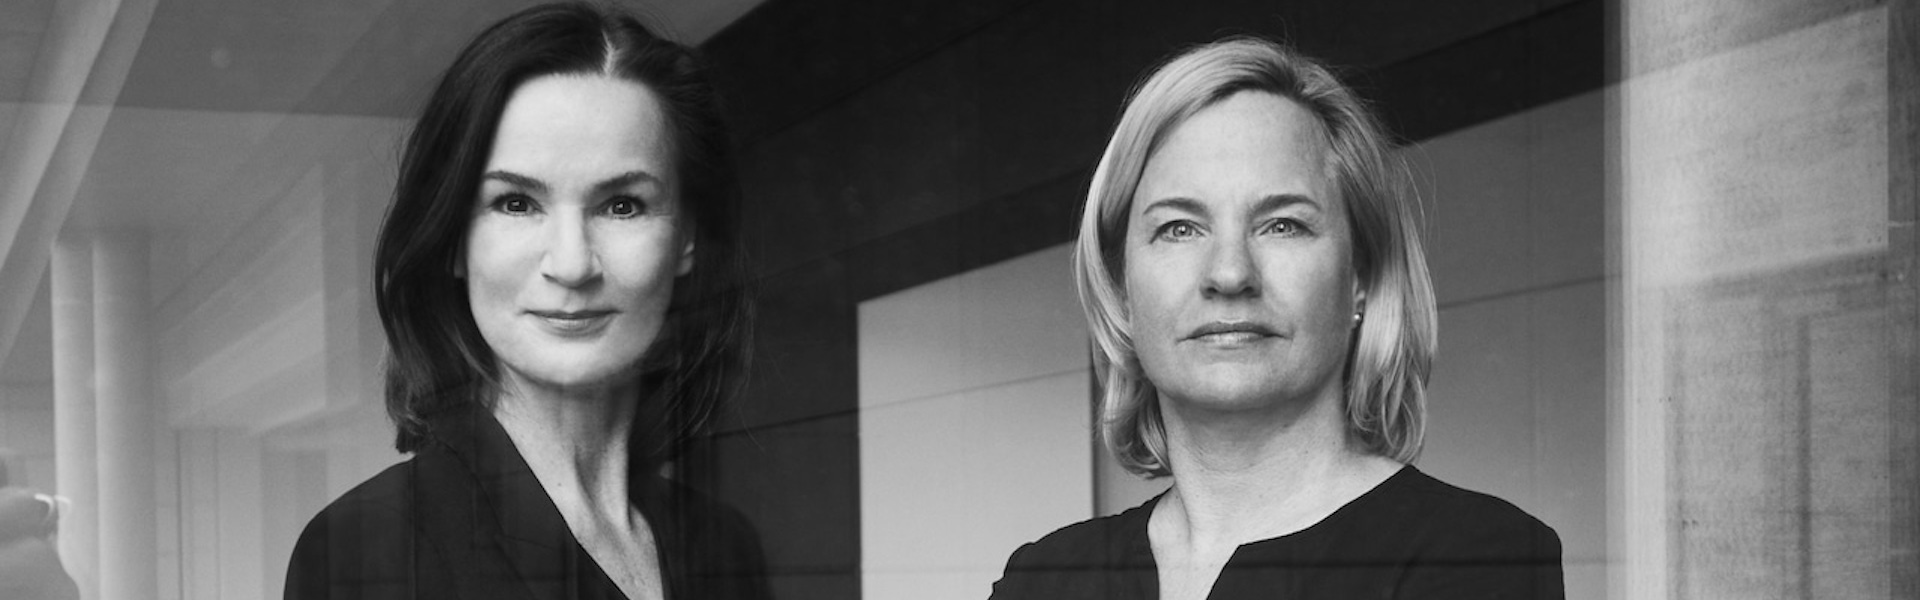 Hildegard Wortmann in Britto Seeger - črno bela slika